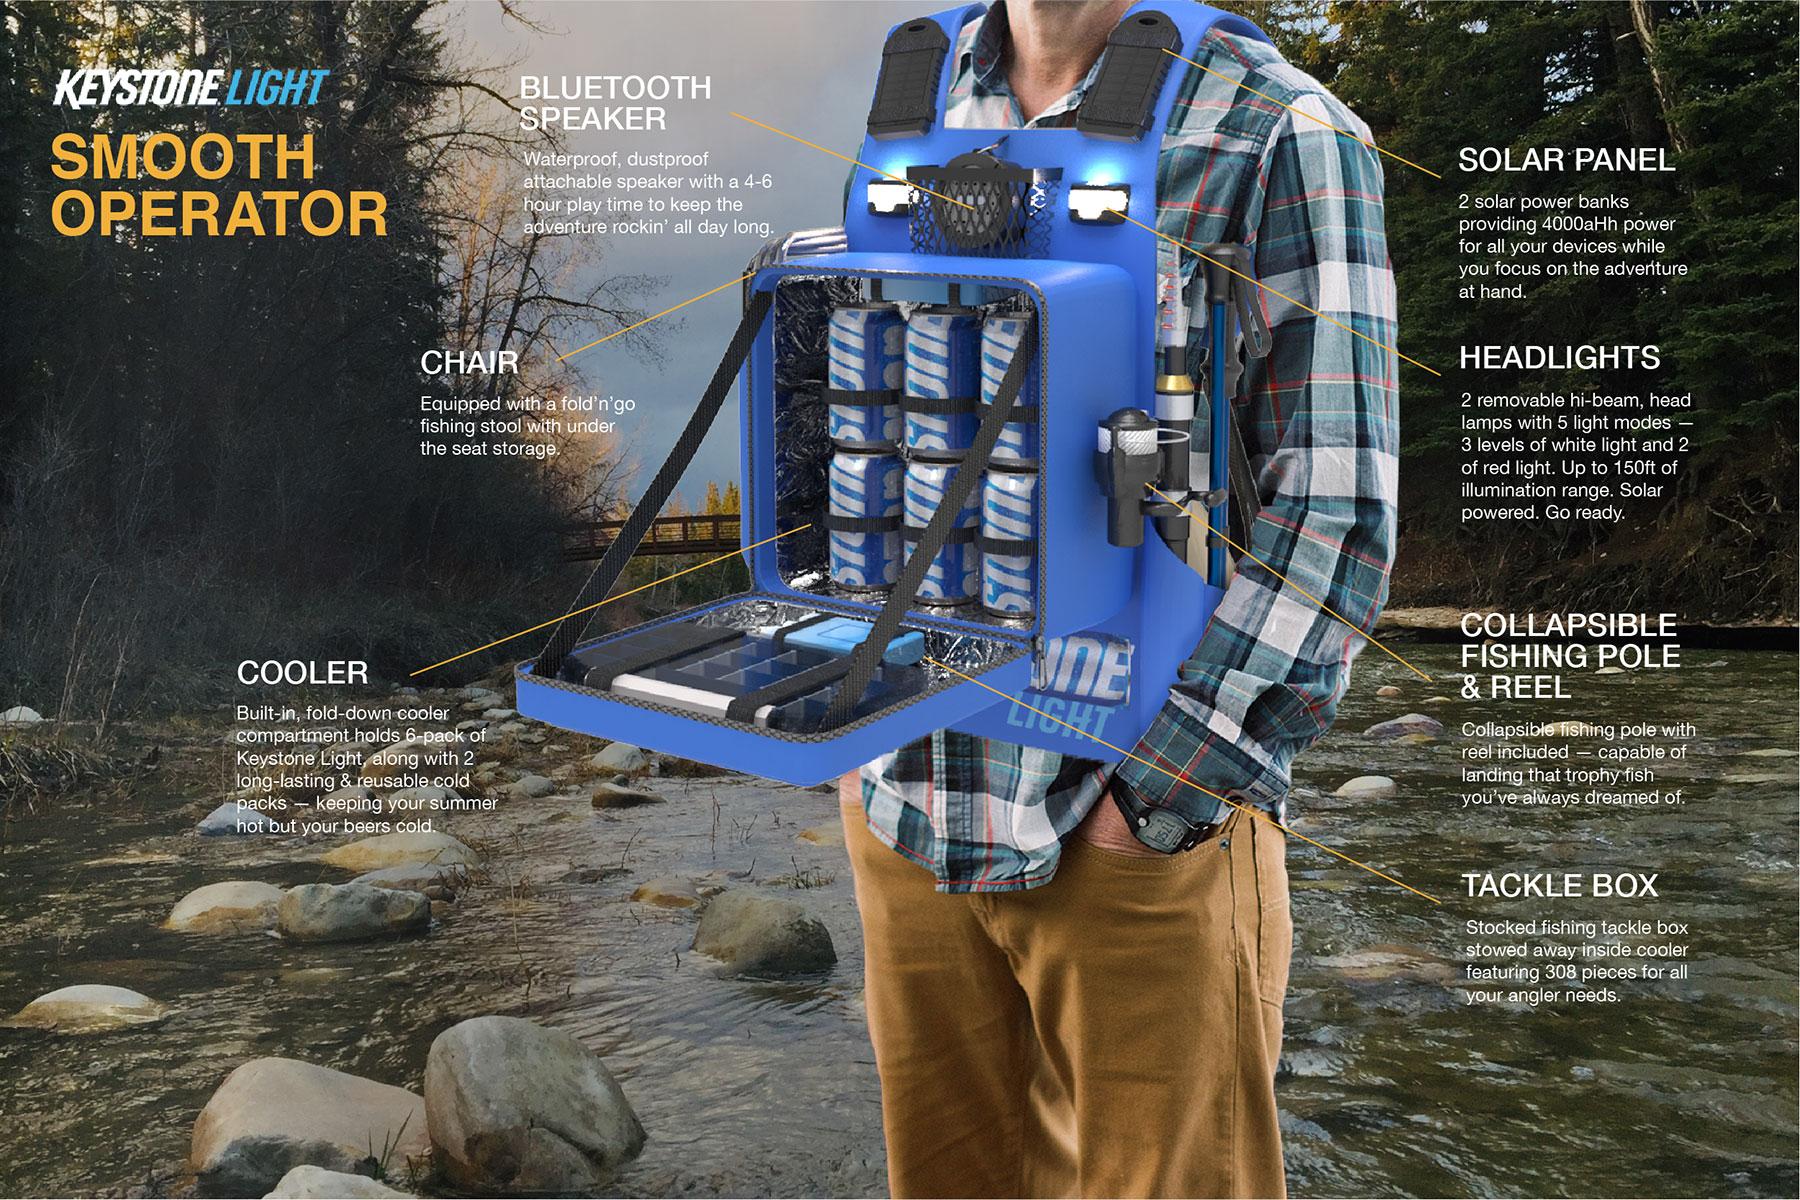 Keystone Smooth Operator Vest